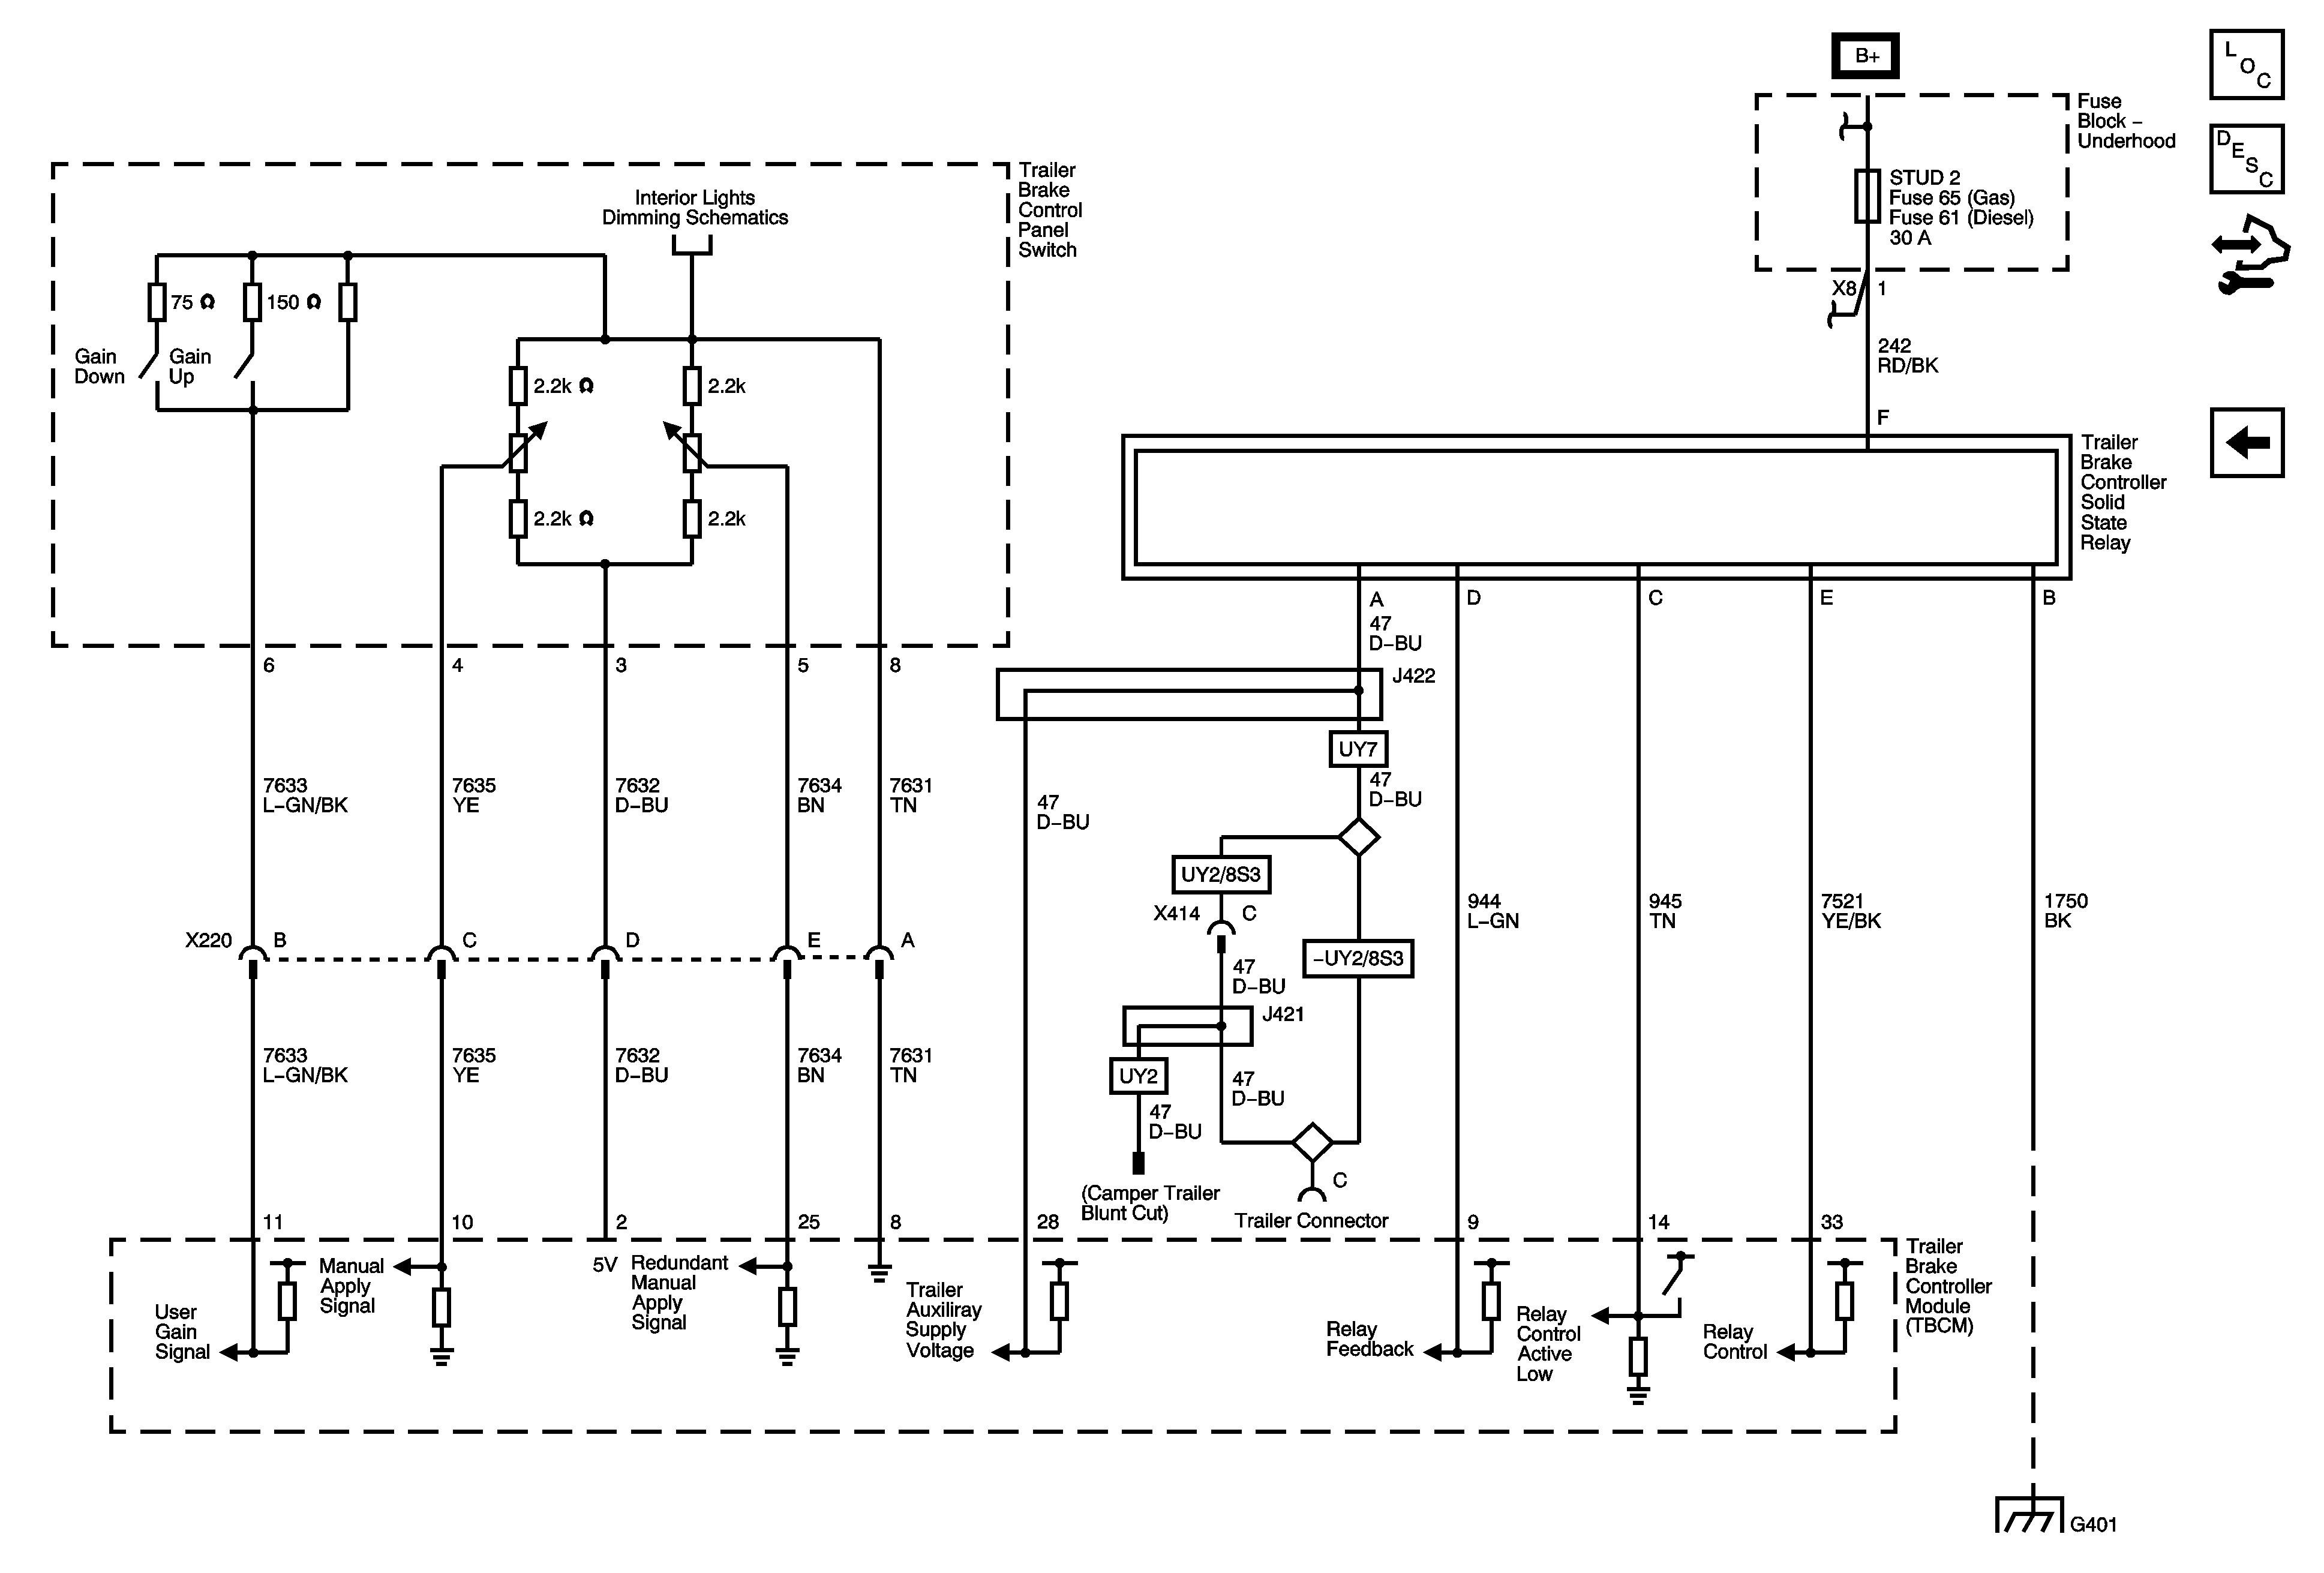 4 prong twist lock plug wiring diagram - 4 prong generator plug wiring  diagram fresh new